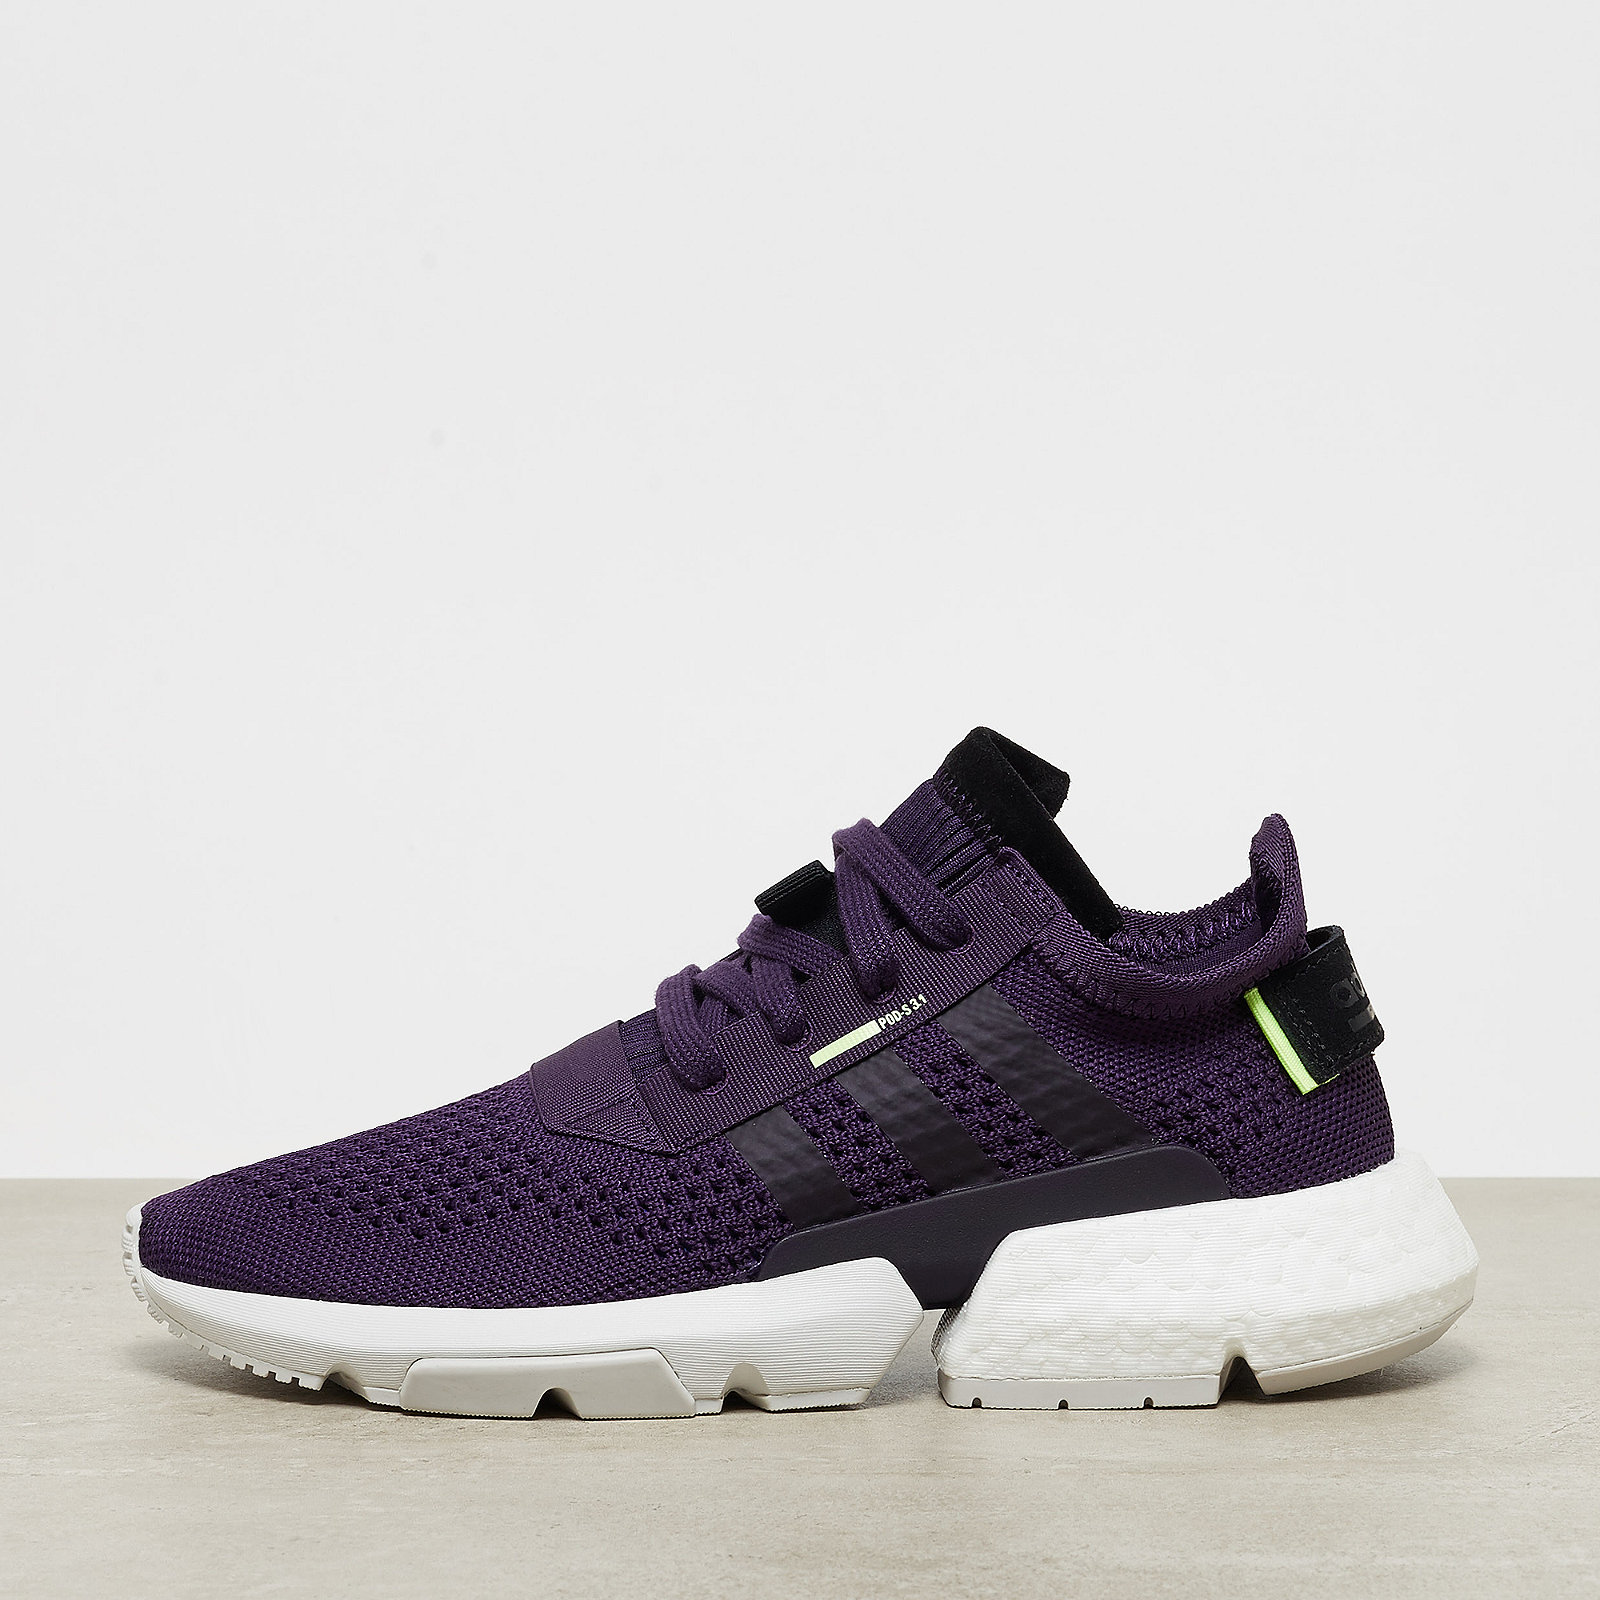 POD-S3.1PK W legend purple/legend purple/hi-re   d purple/hi